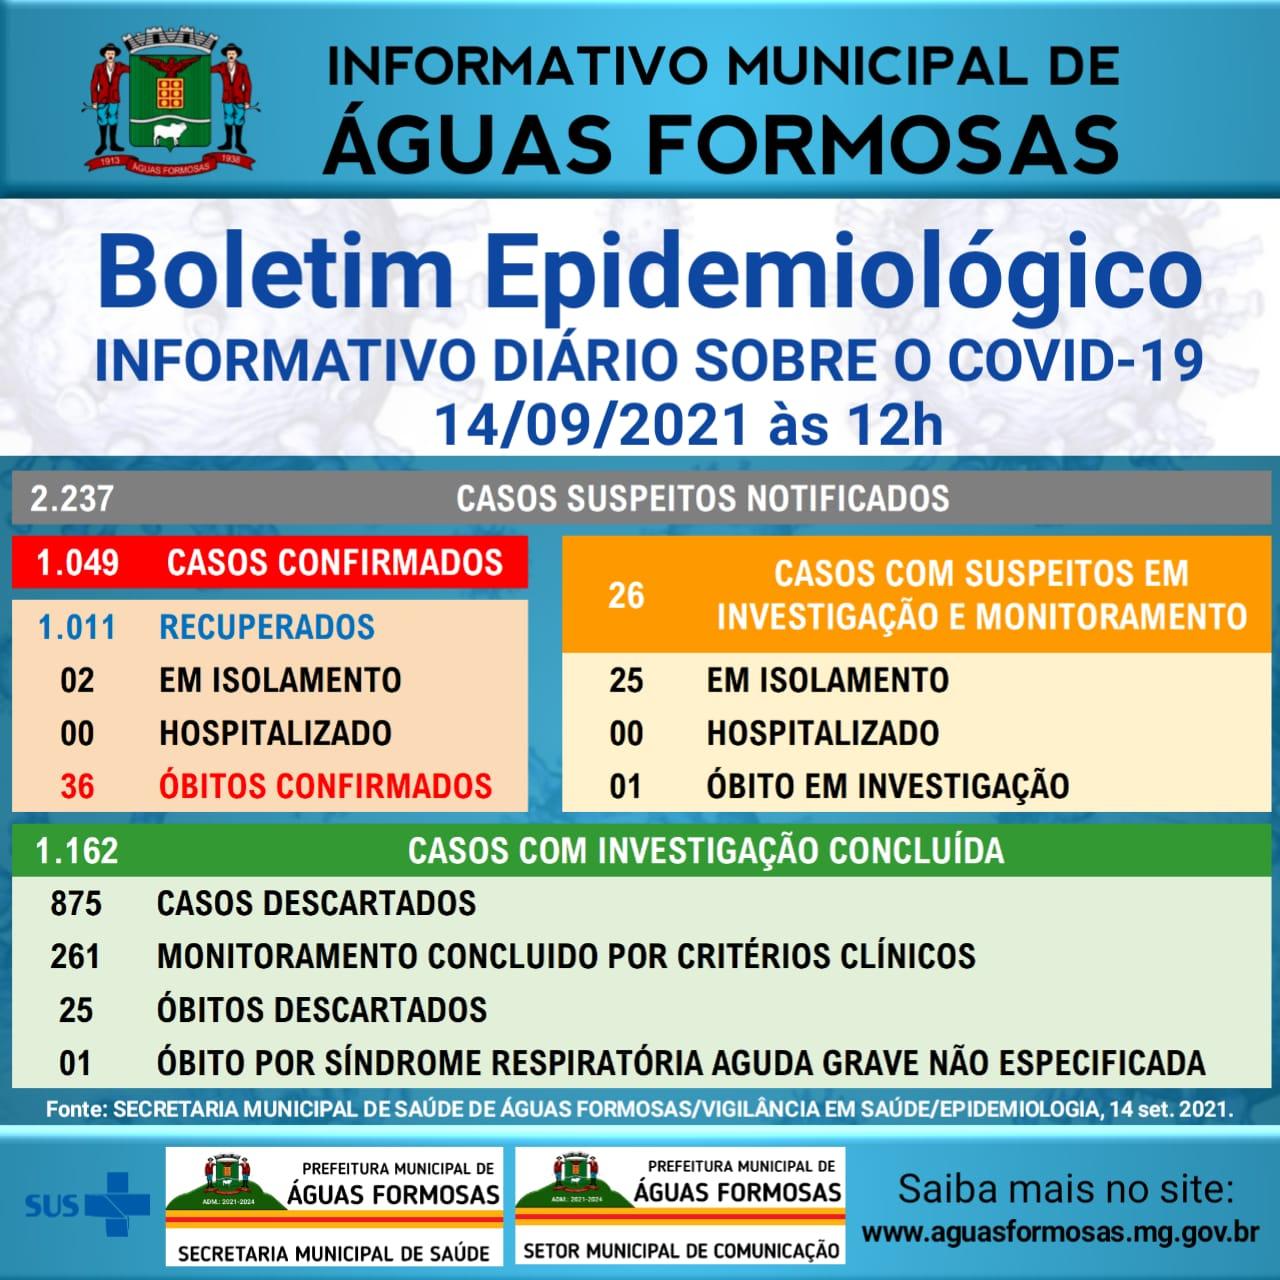 BOLETIM EPIDEMIOLÓGICO CORONAVÍRUS - 14/09/2021